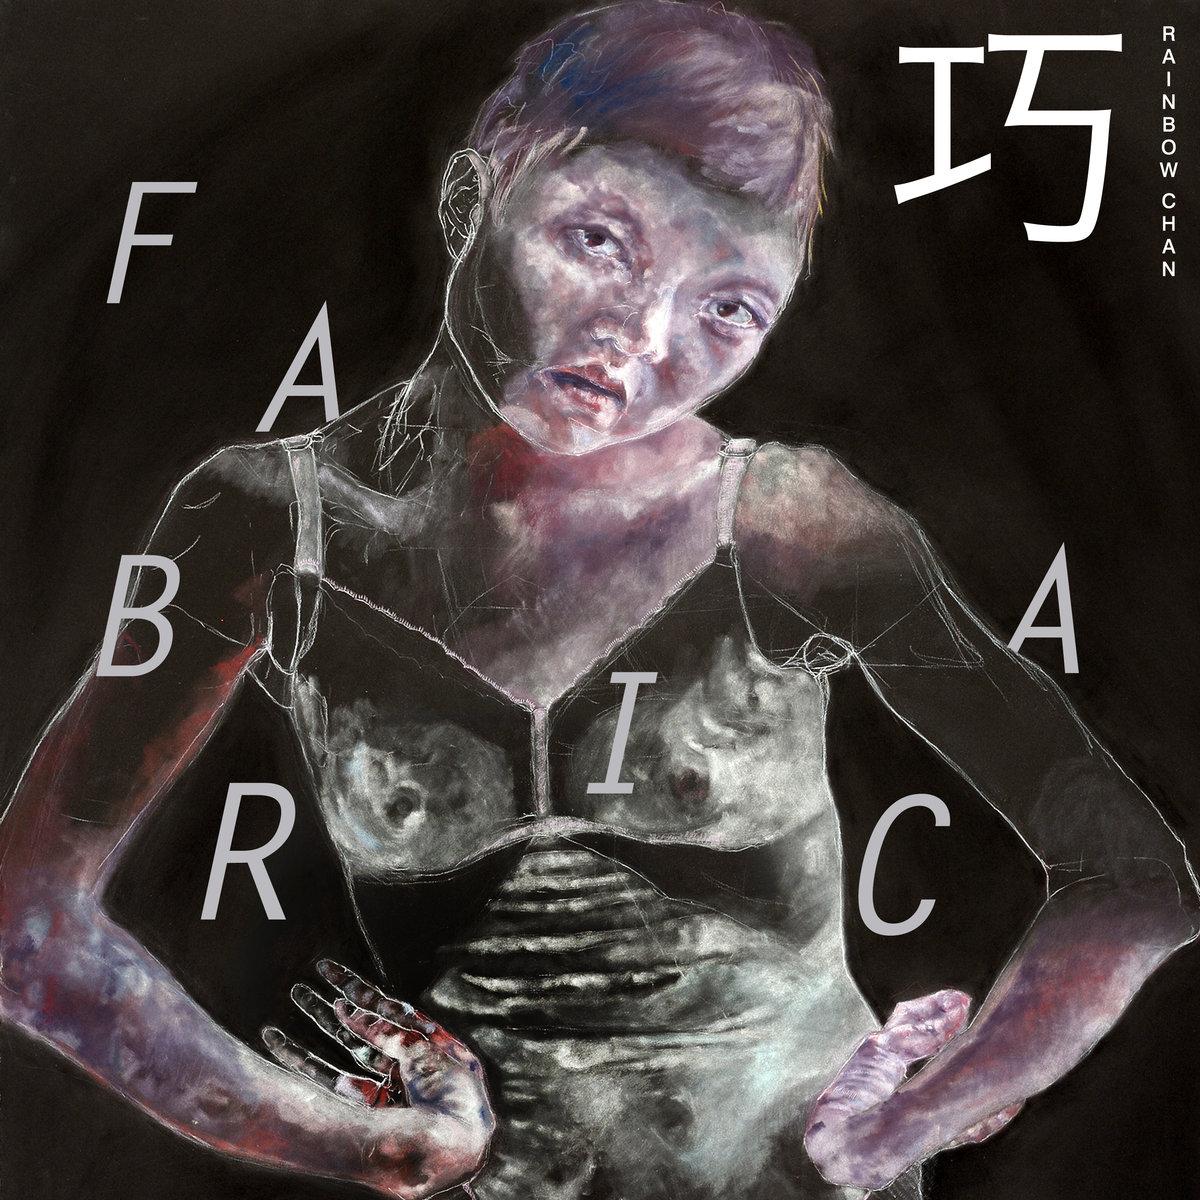 RAINBOW CHAN - FABRICA - EPMIXED